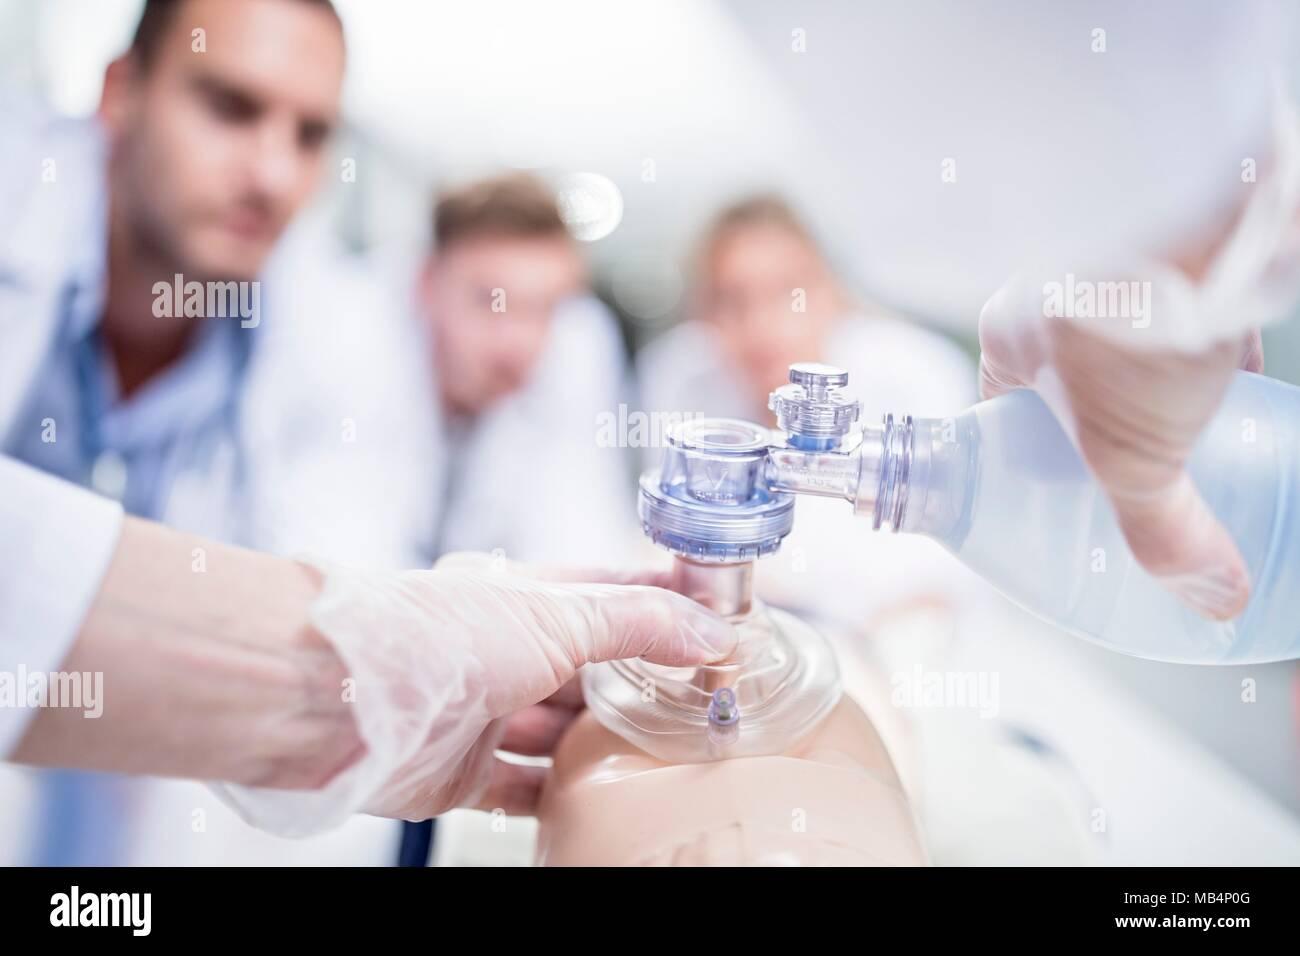 MODEL RELEASED. Doctor practising bag-valve-mask ventilation on a training dummy. - Stock Image